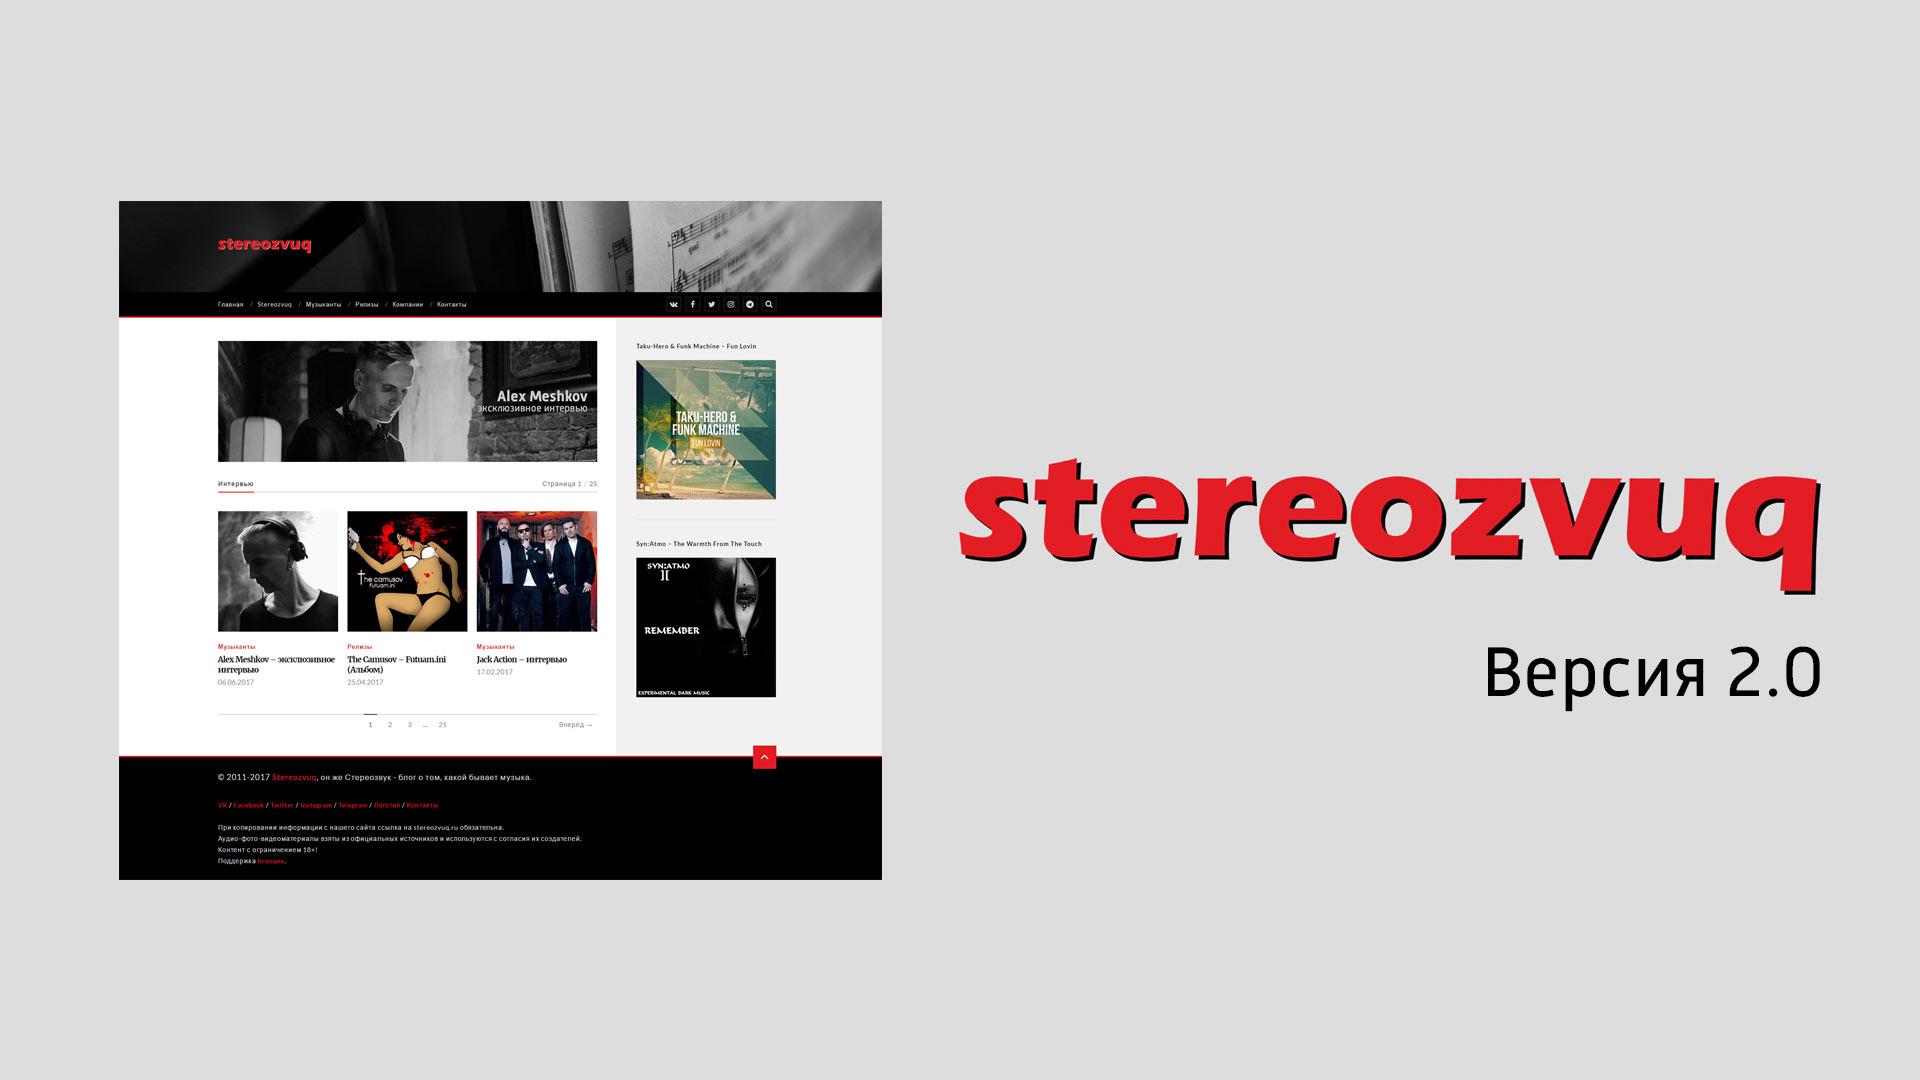 Stereozvuq (Версия 2.0)